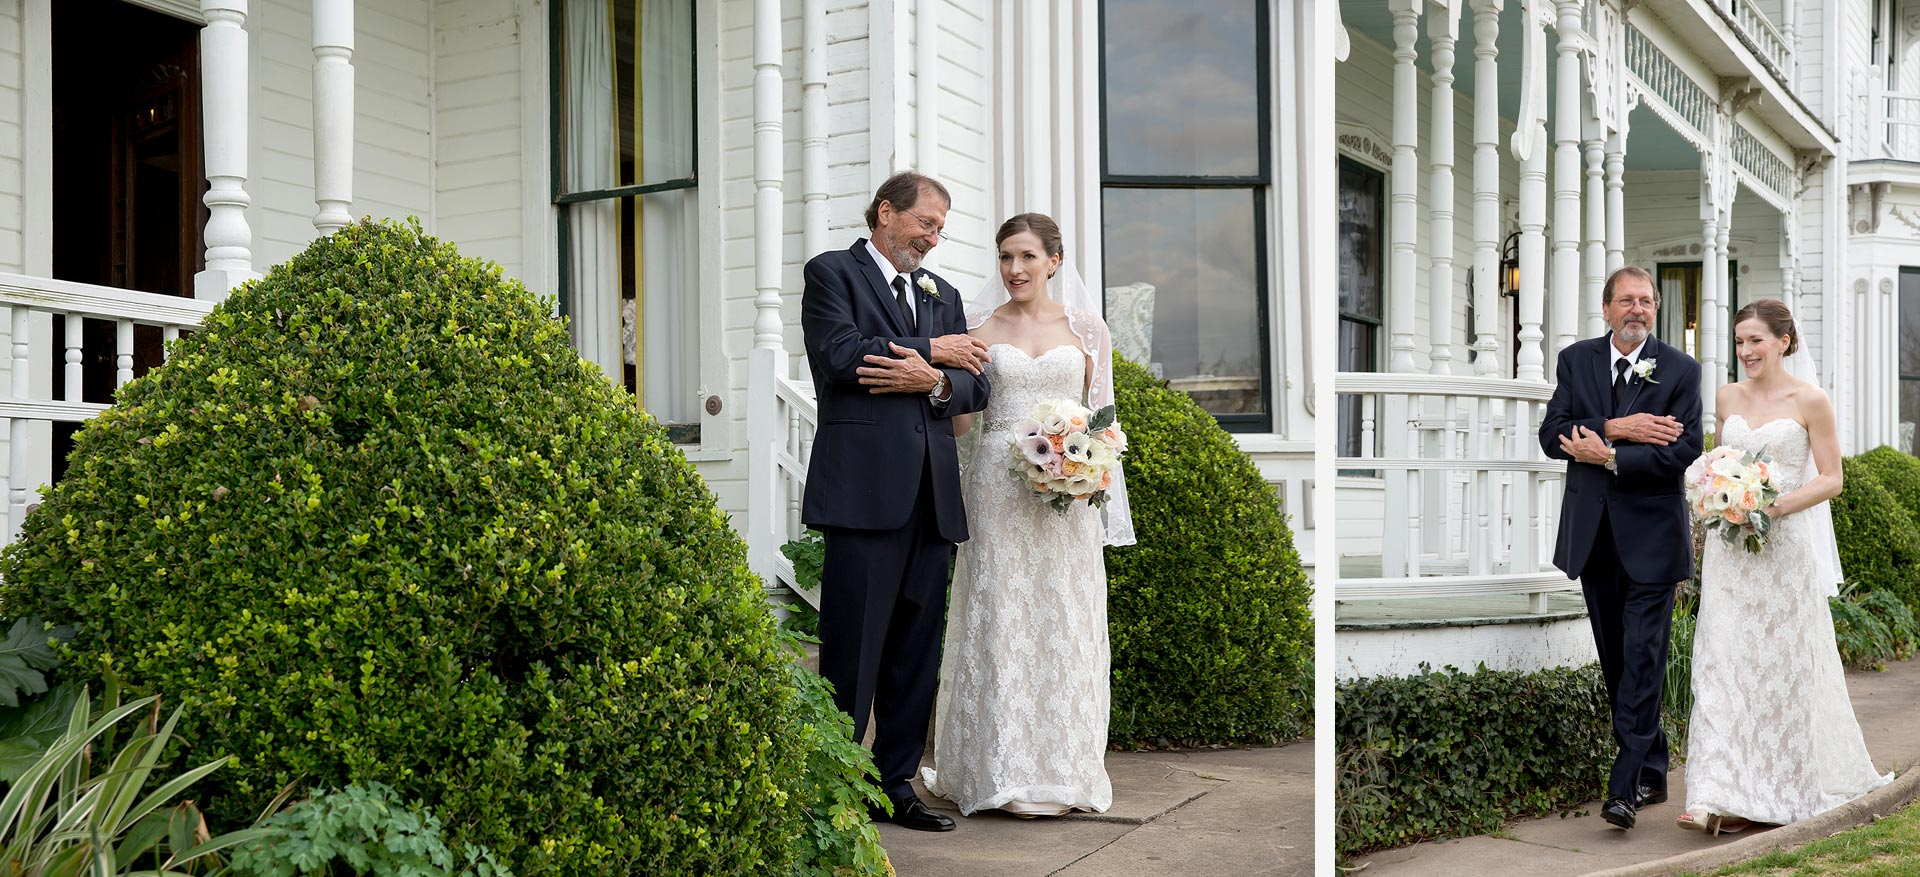 Wedding at Bar Mansion